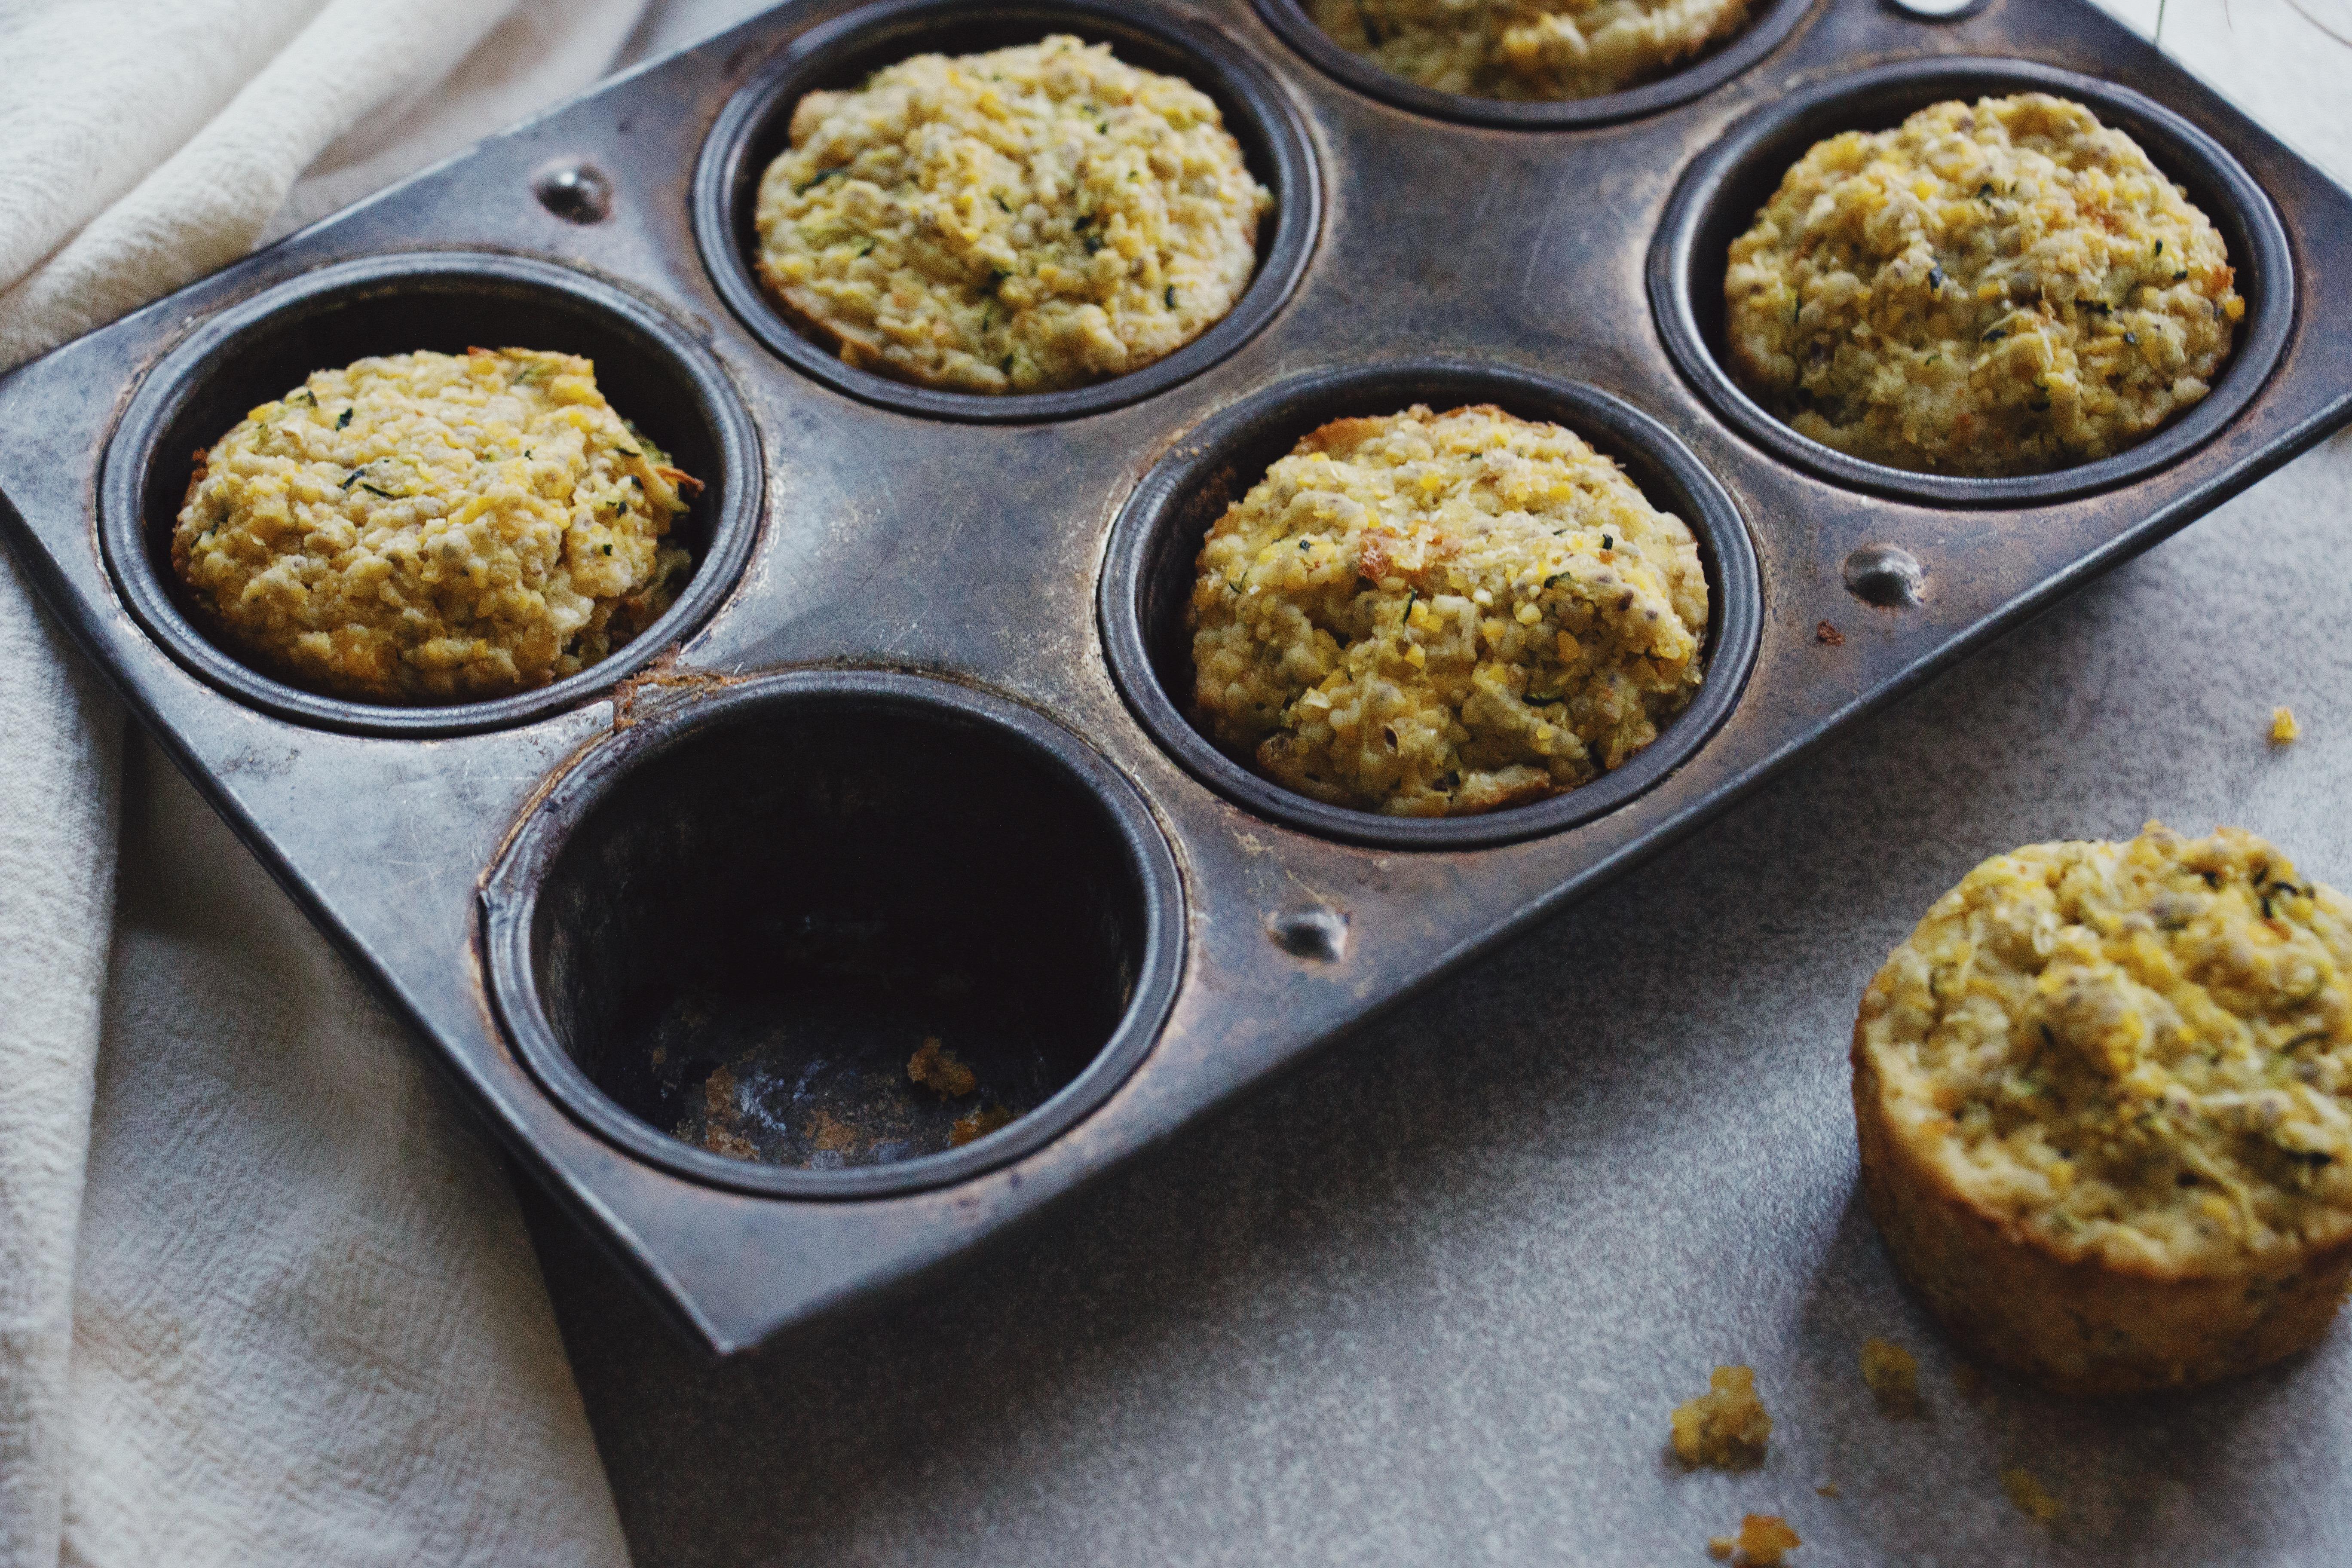 Cornbread Muffins with Zucchini and Chili Flakes